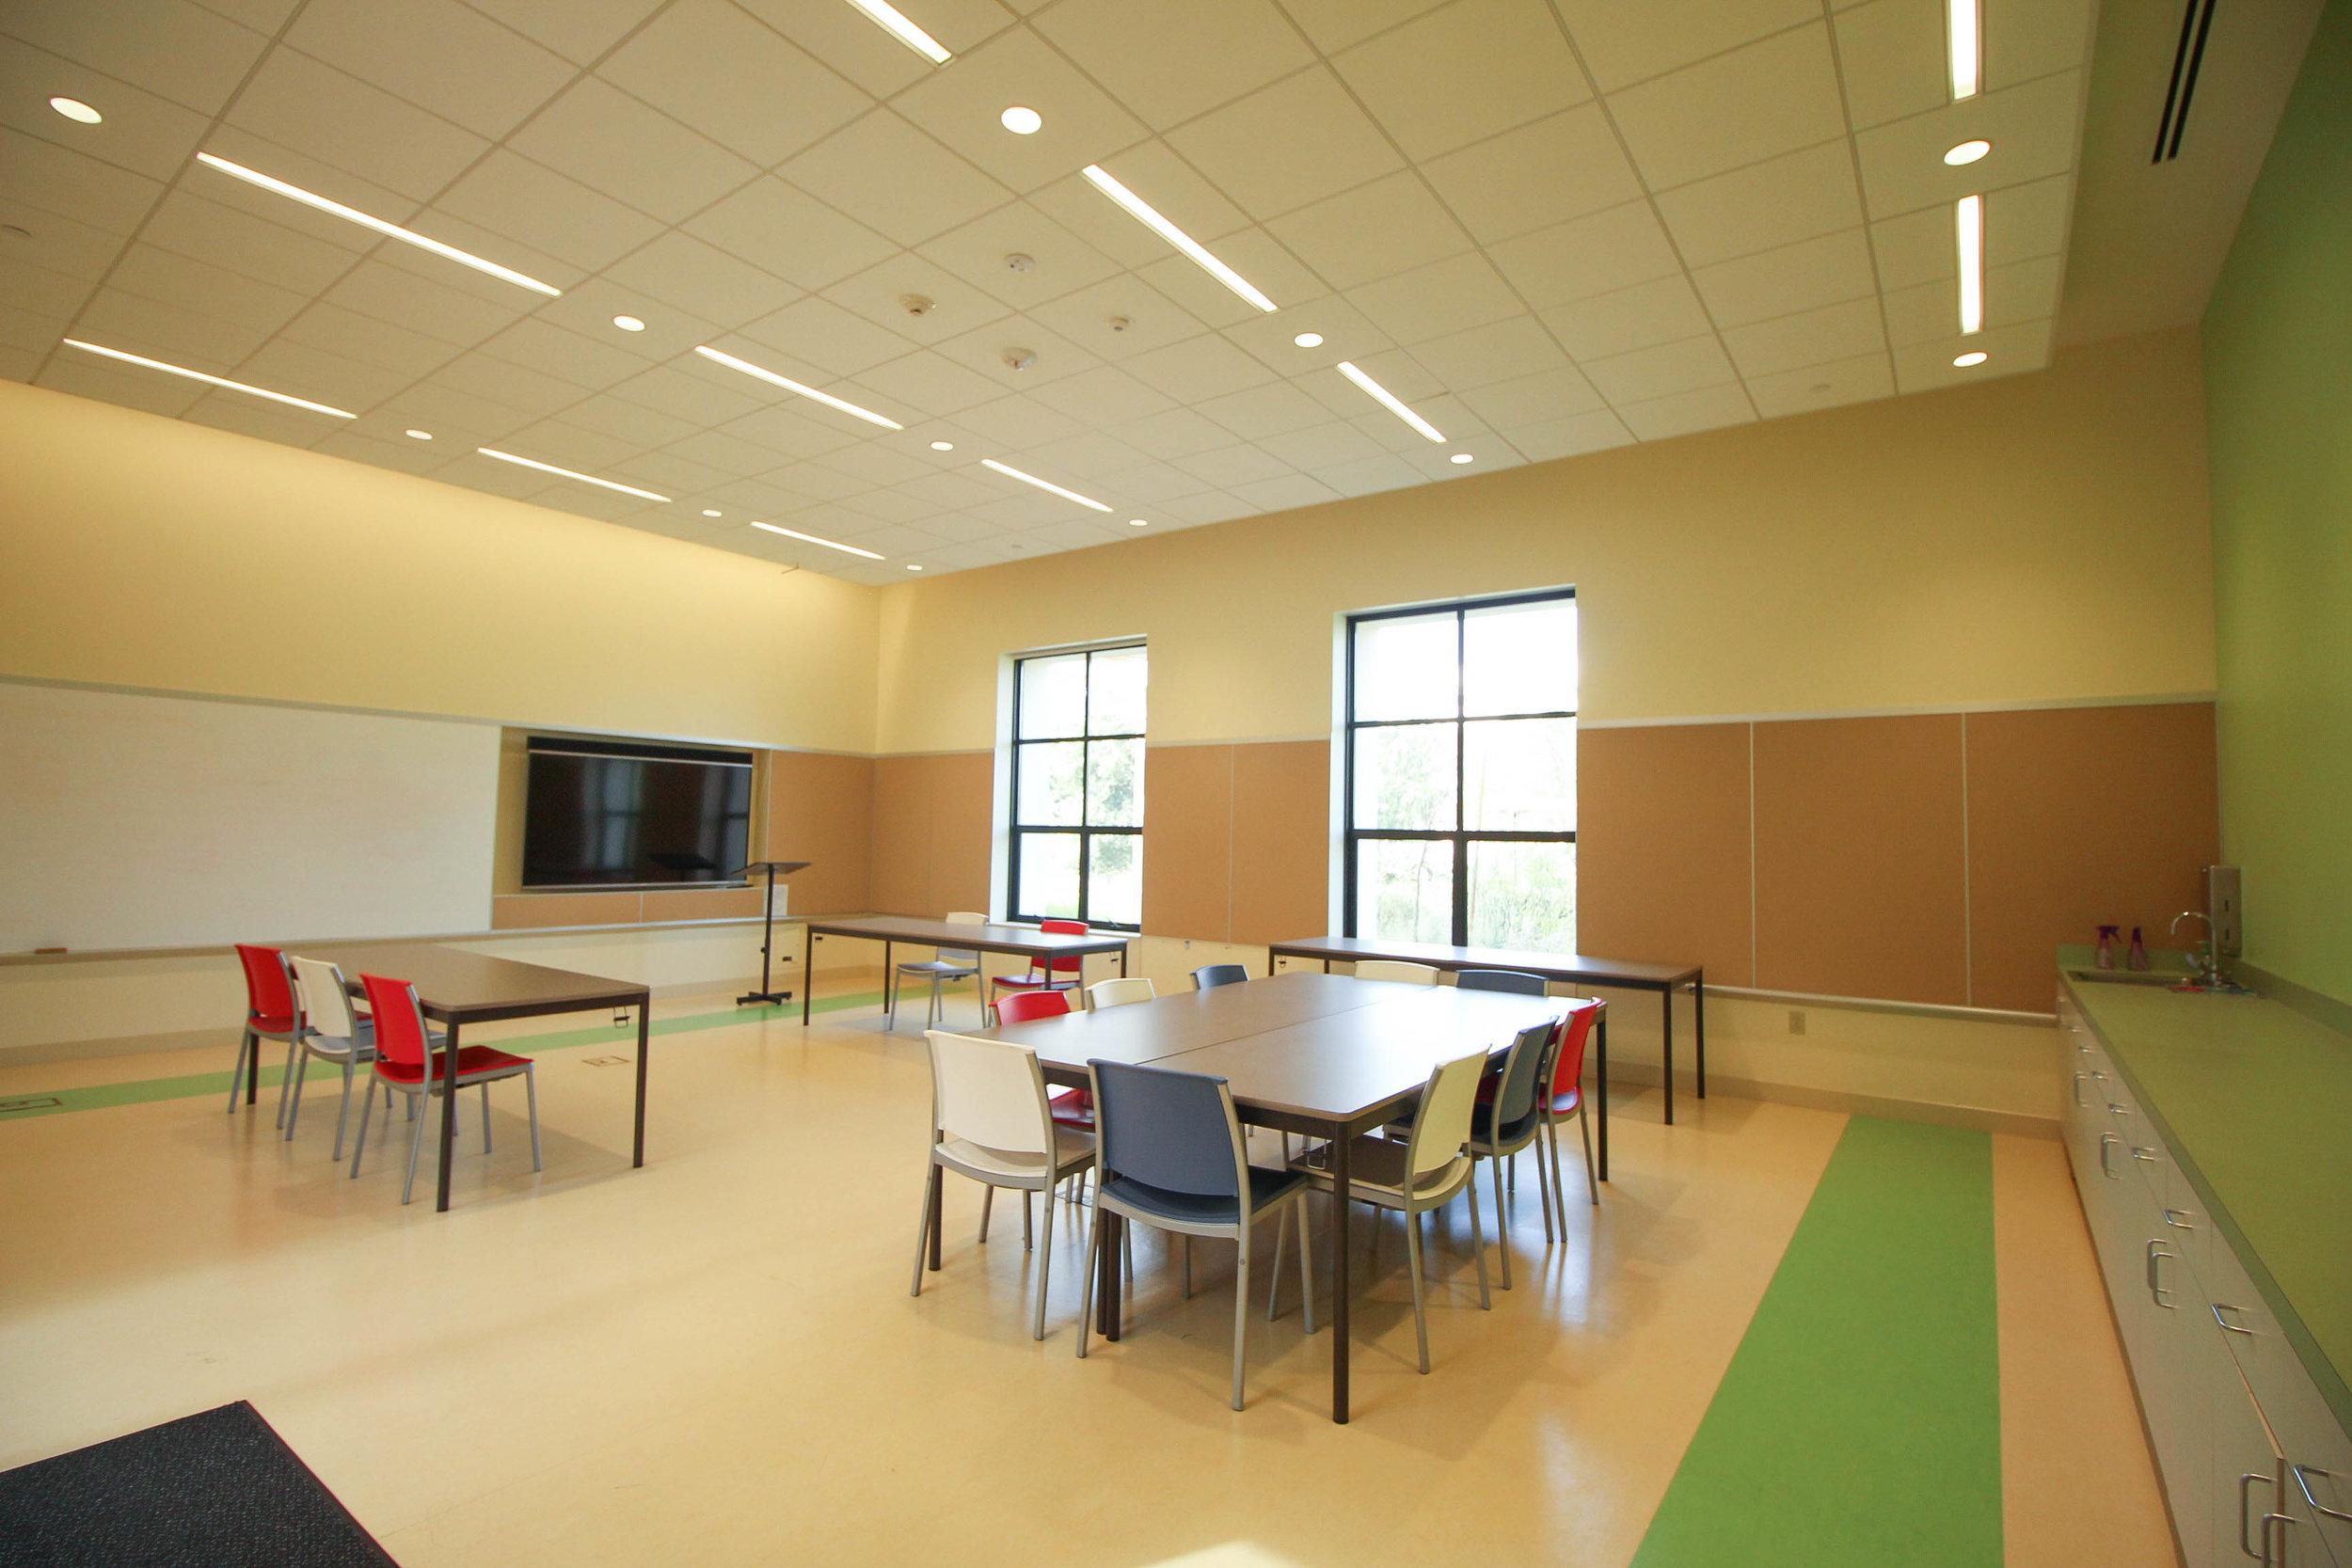 Steven's Classroom